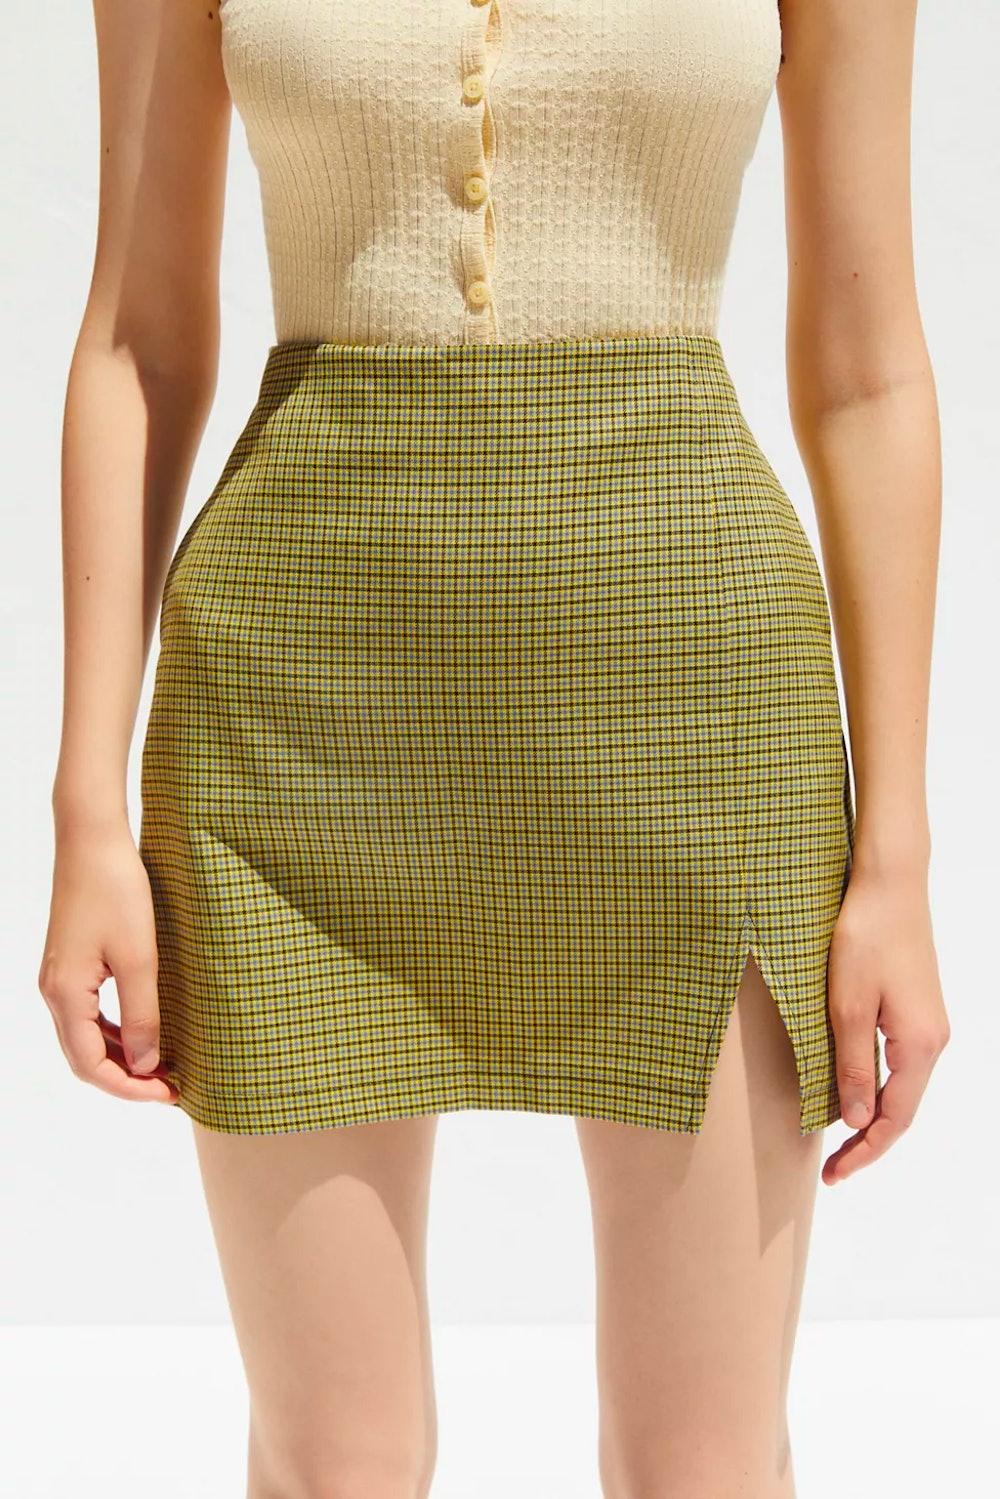 Darren Notched Pelmut Mini Skirt